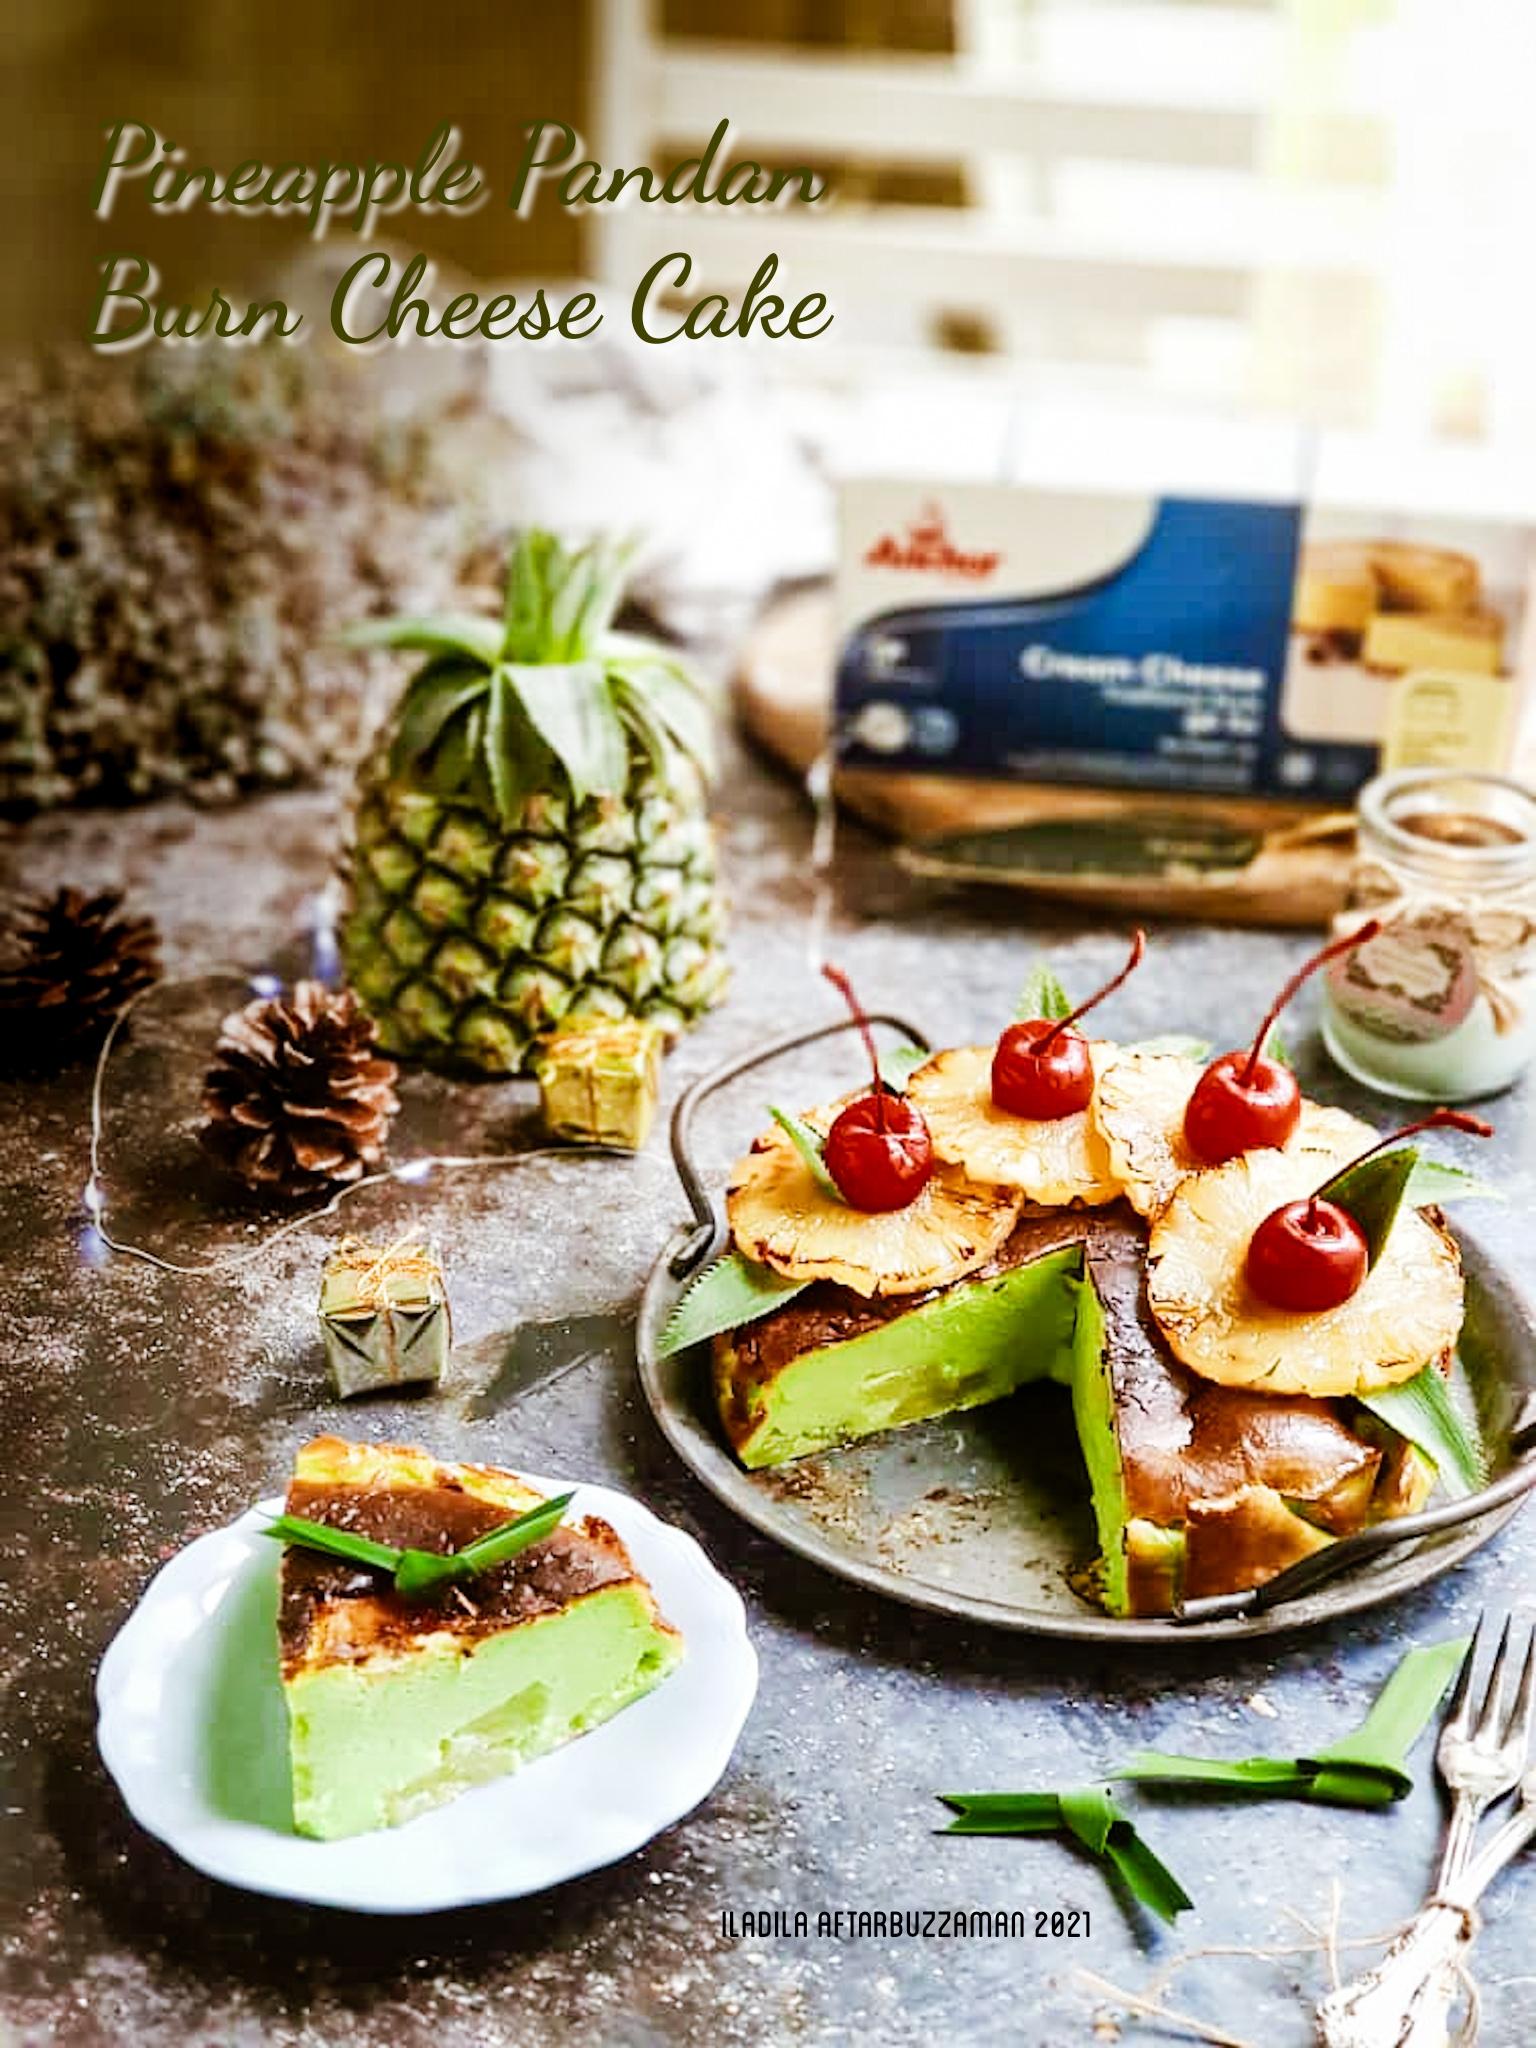 Pineapple Pandan Burnt Cheese Cake